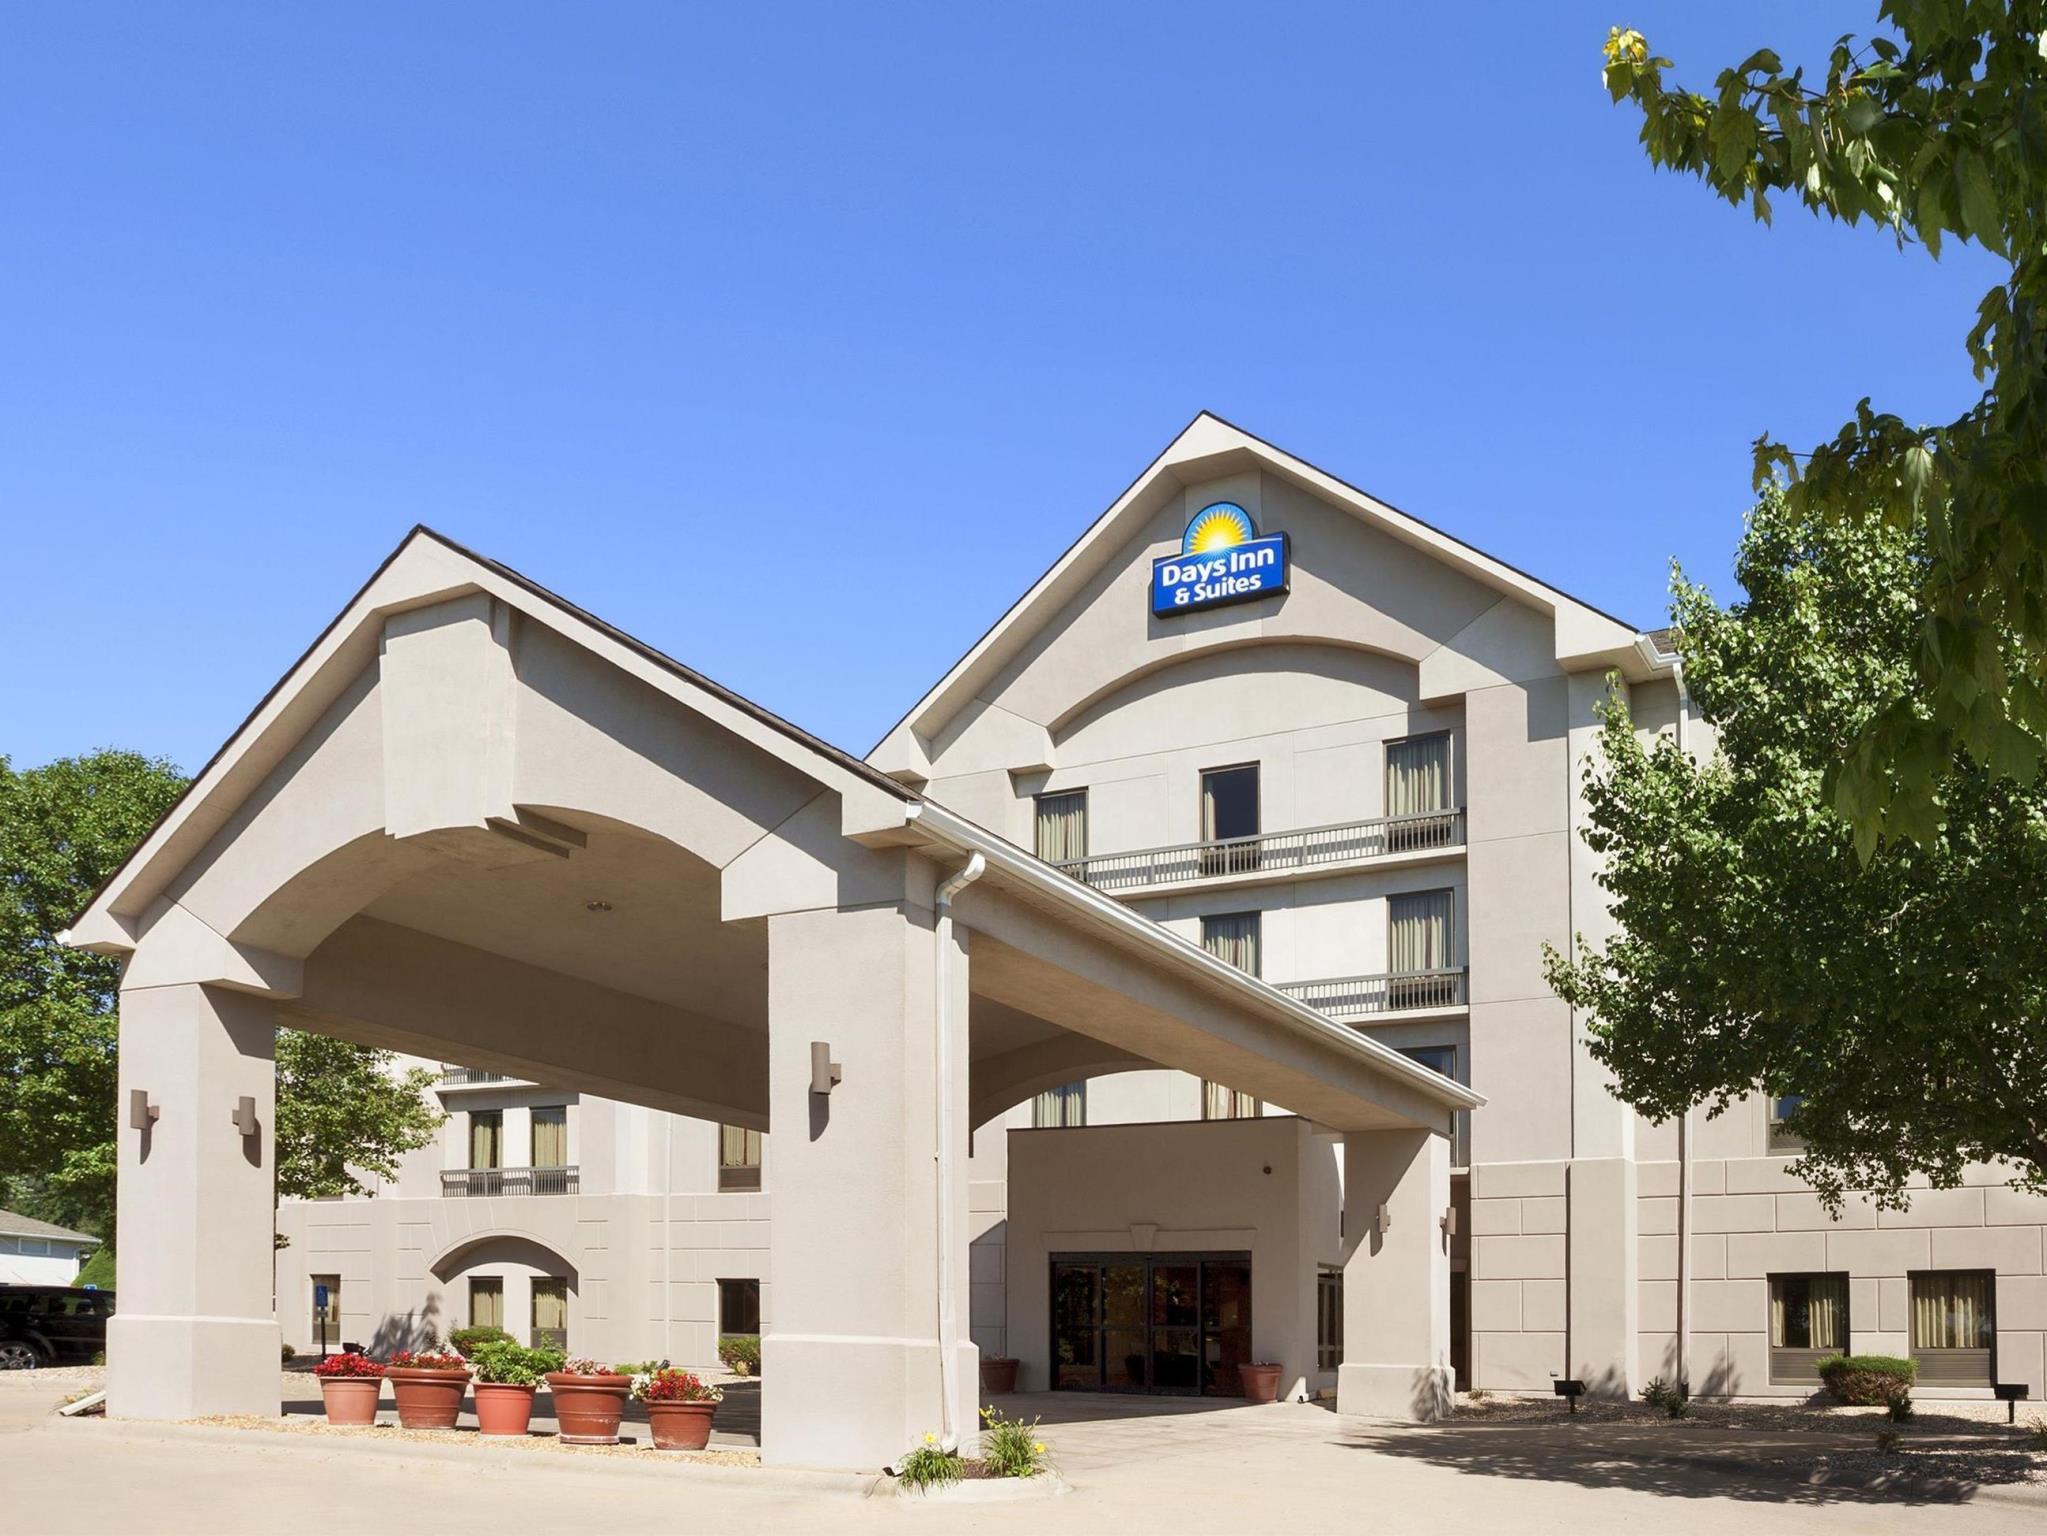 Days Inn And Suites By Wyndham Cedar Rapids